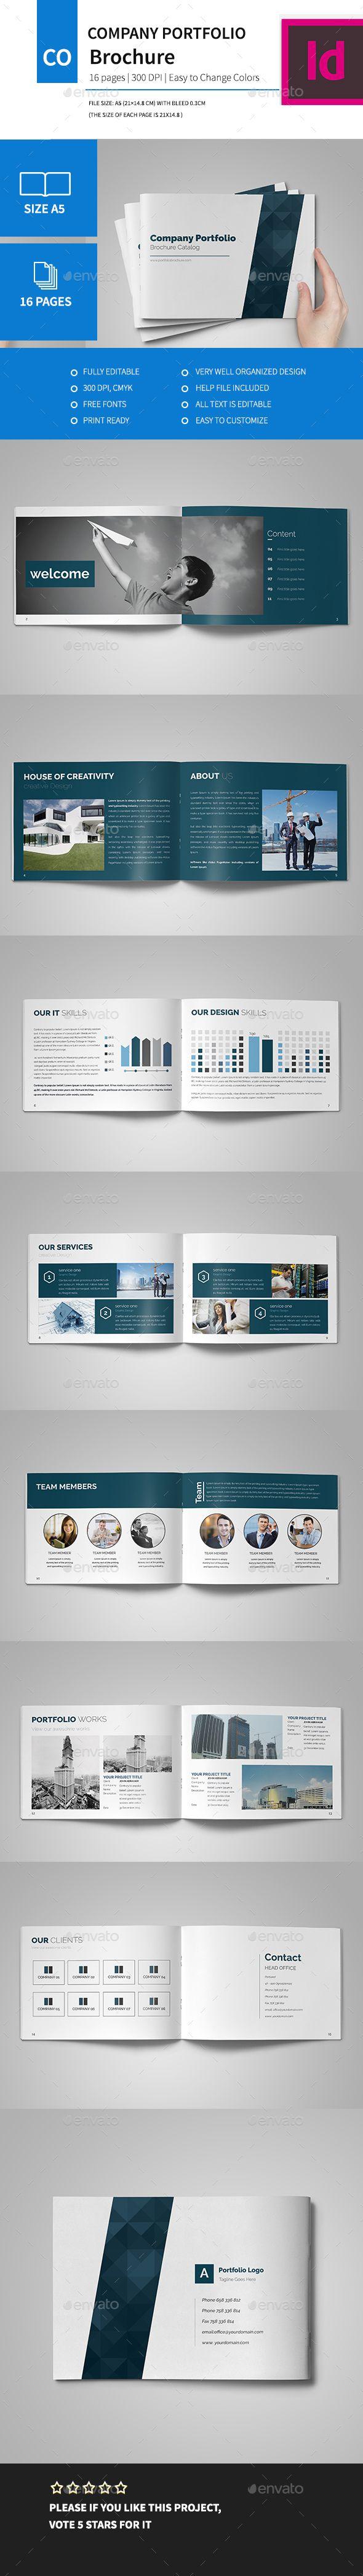 best 25+ company portfolio ideas on pinterest | company brochure, Presentation templates